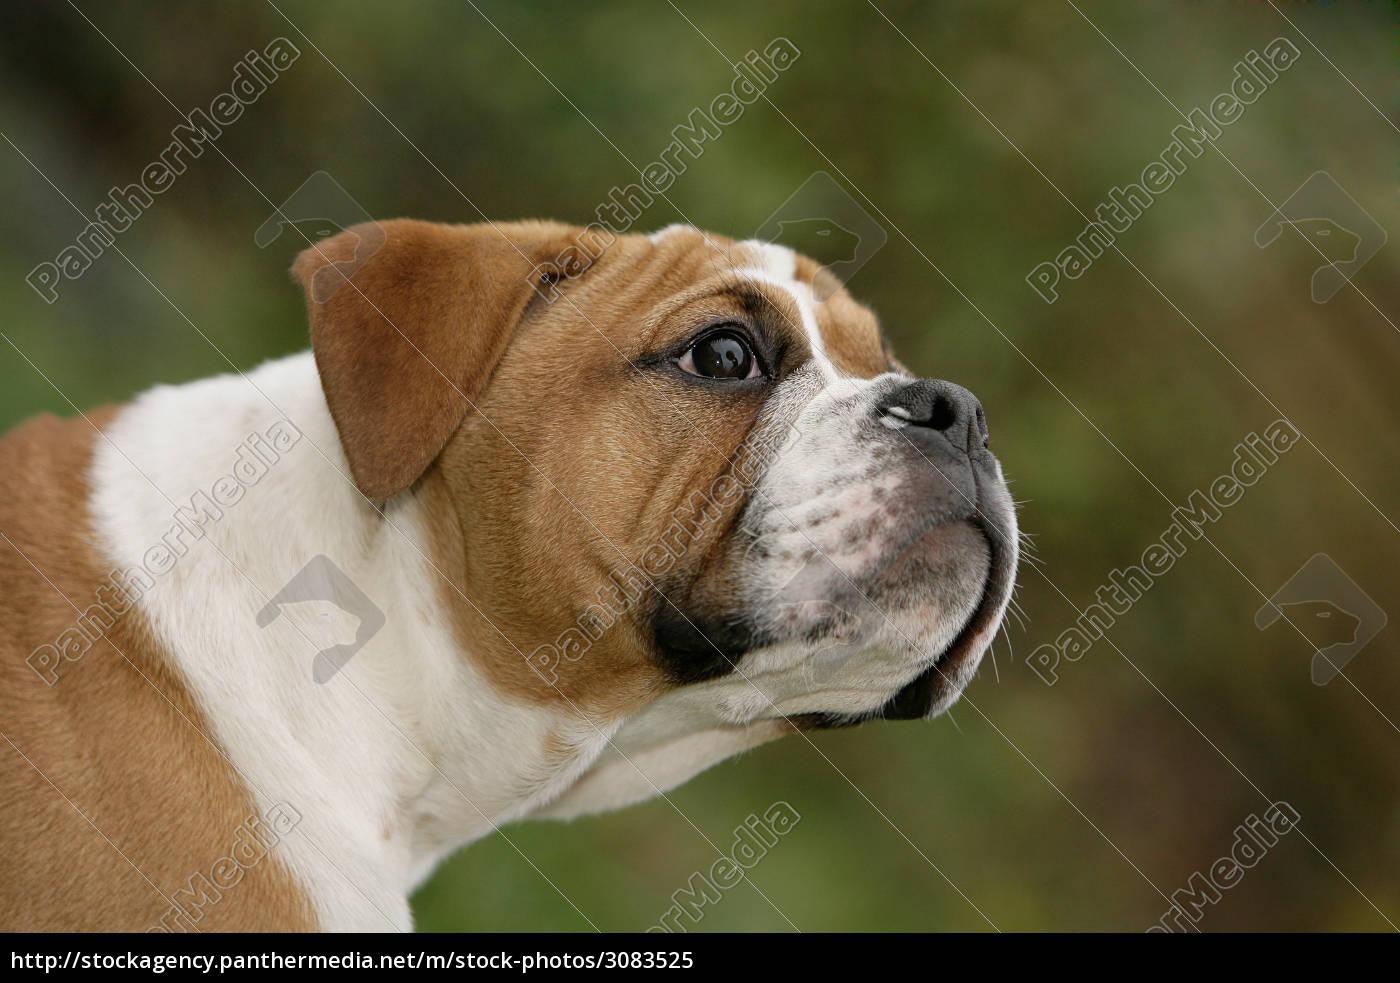 Continental Bulldog Puppy Stock Photo 3083525 Panthermedia Stock Agency